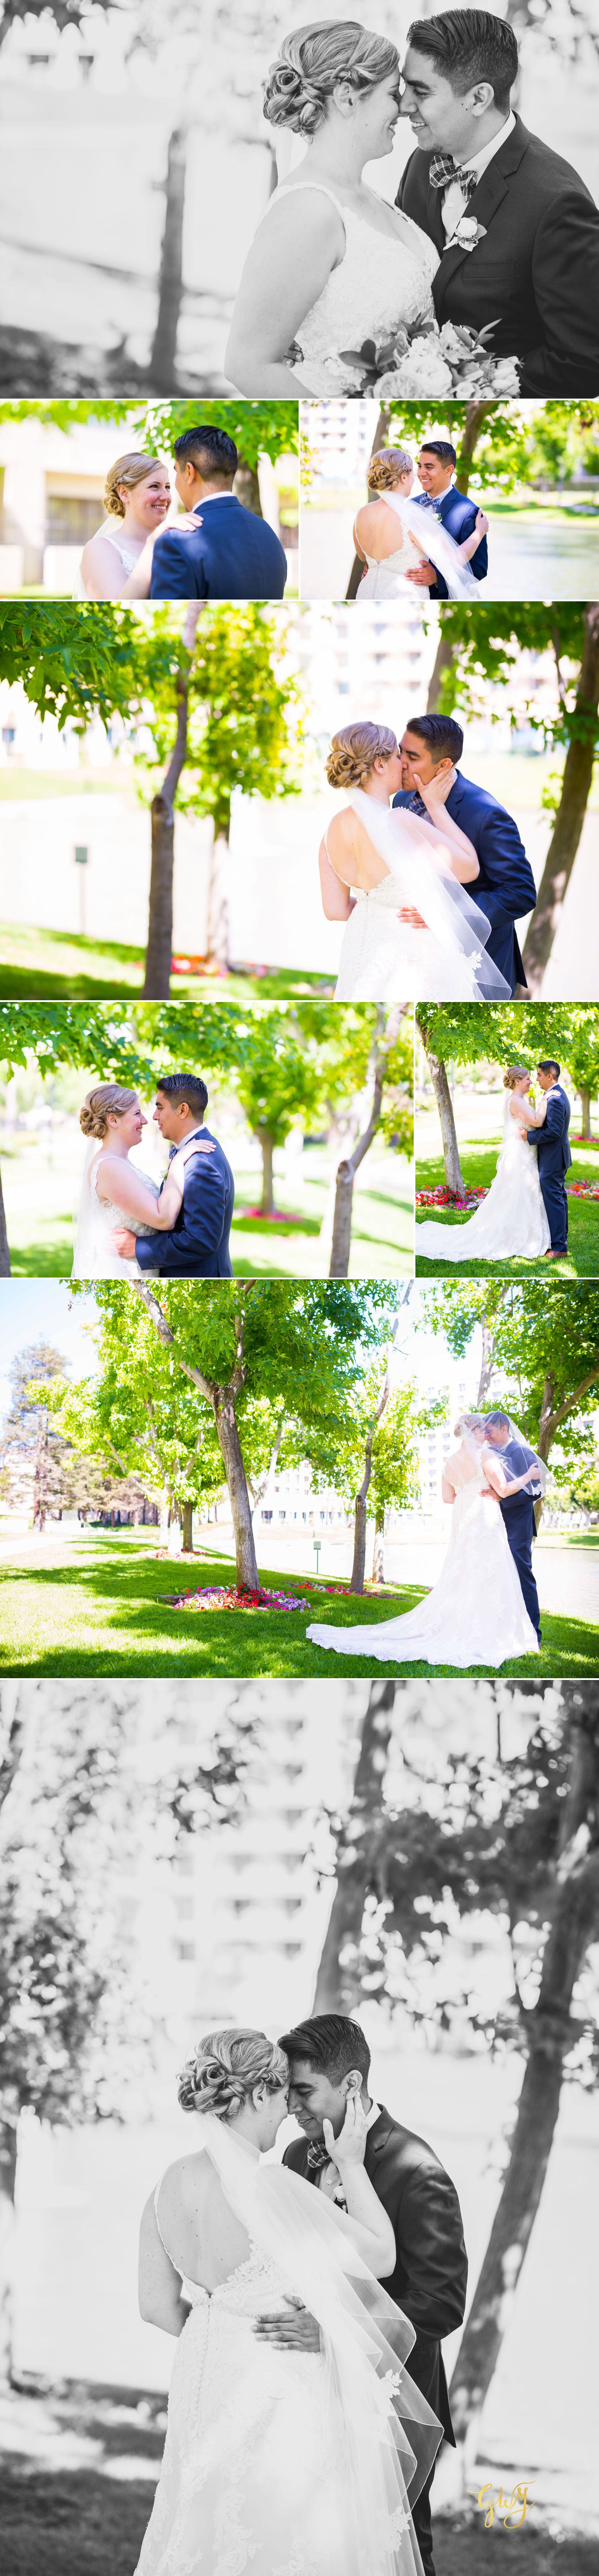 Javier + Kari Avenue of the Arts First Look Vintage Rose Wedding Ceremony Reception by Glass Woods Media 11.jpg